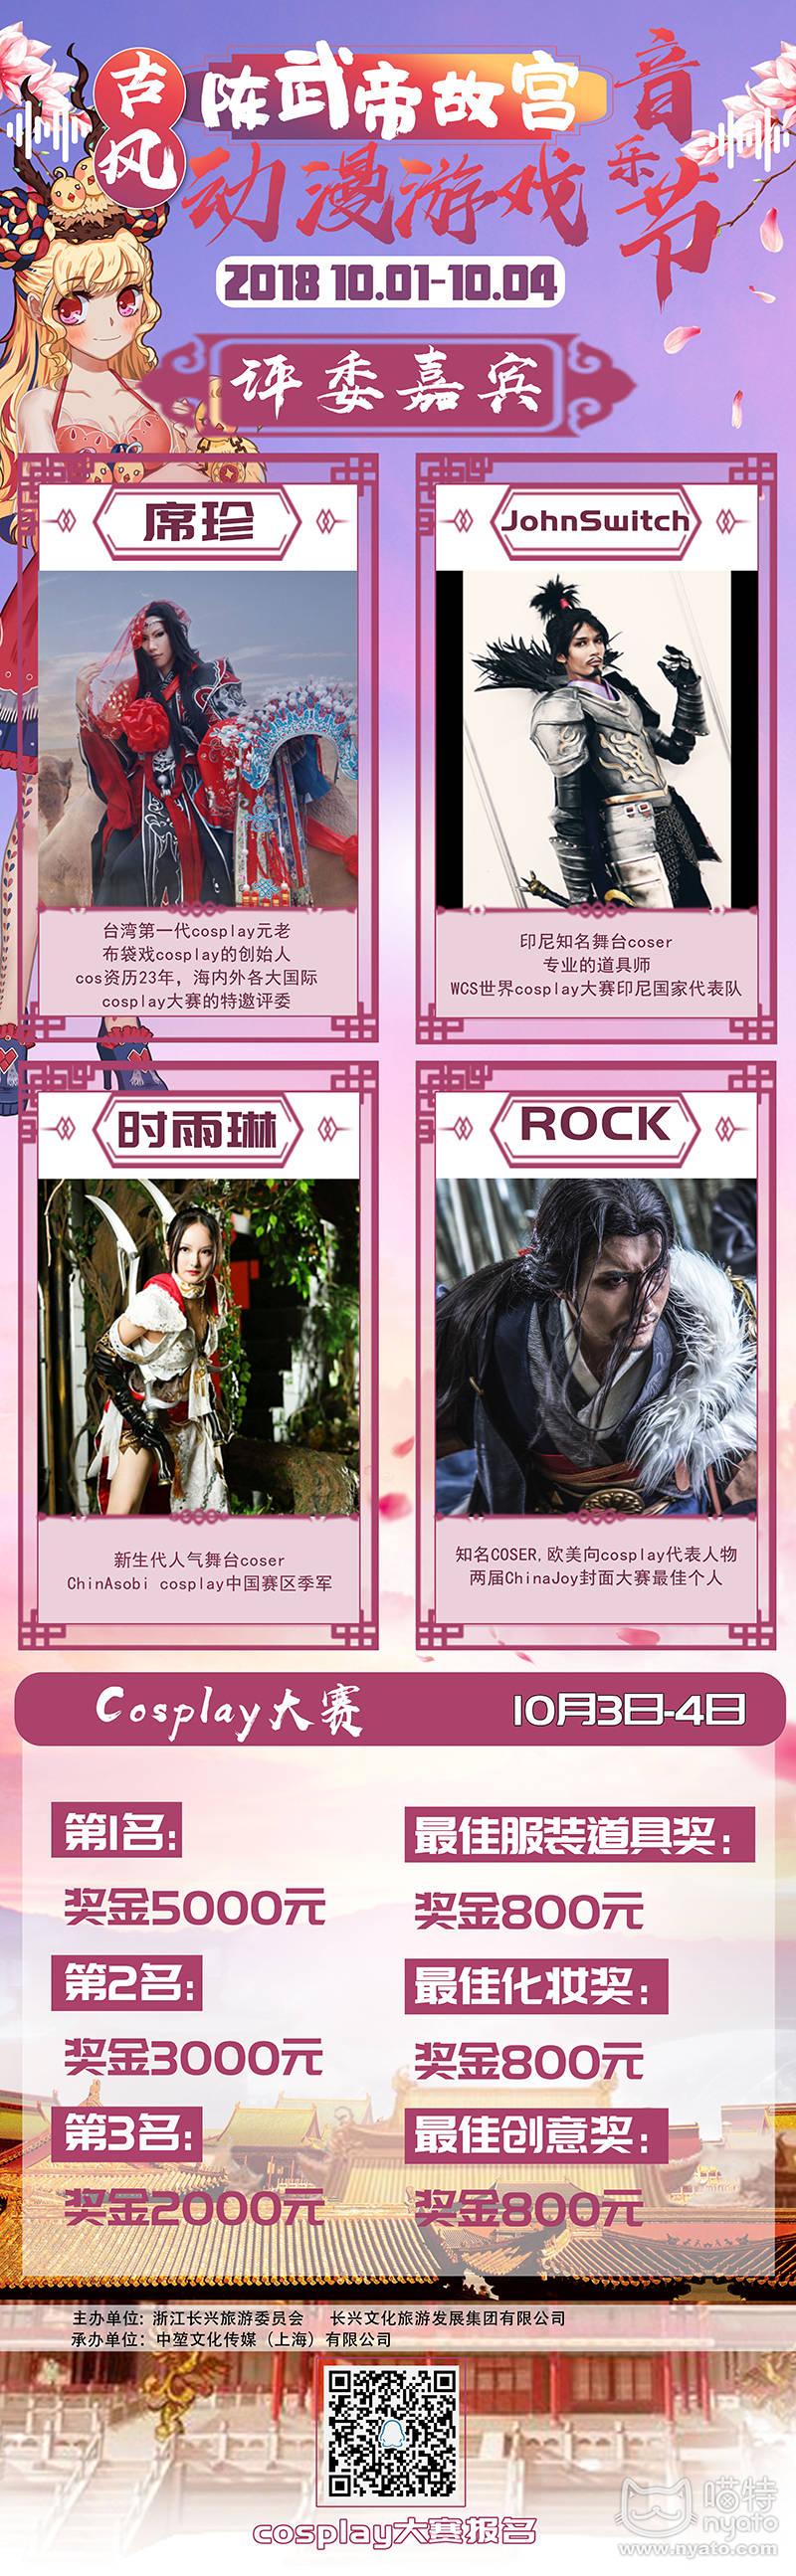 cosplay的副本 2.jpg